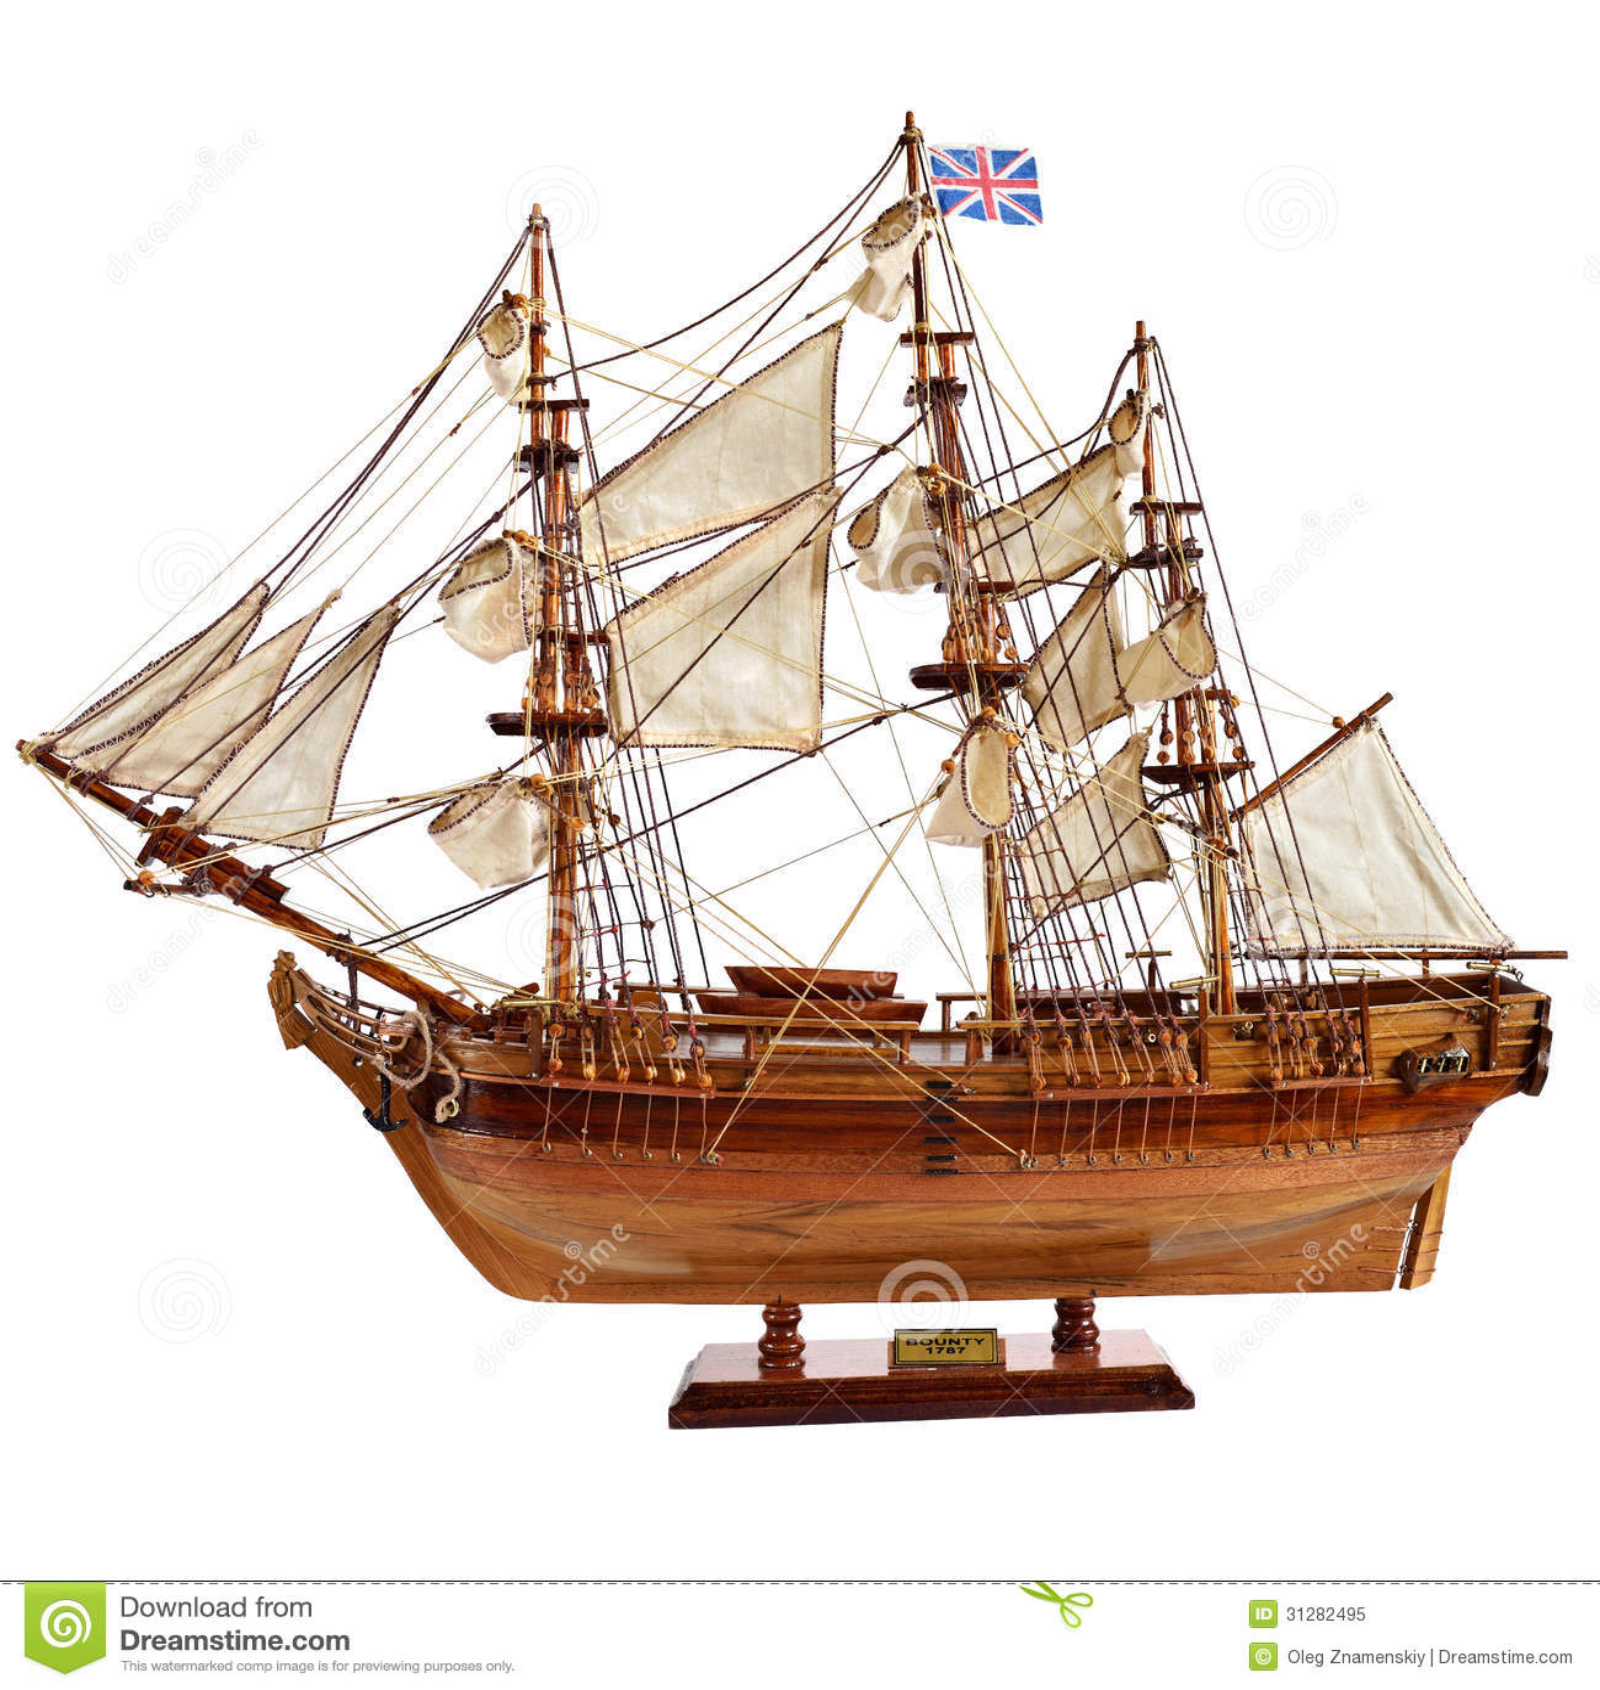 Replica Of The Old Sailfish Bounty Stock Image - Image: 31282495